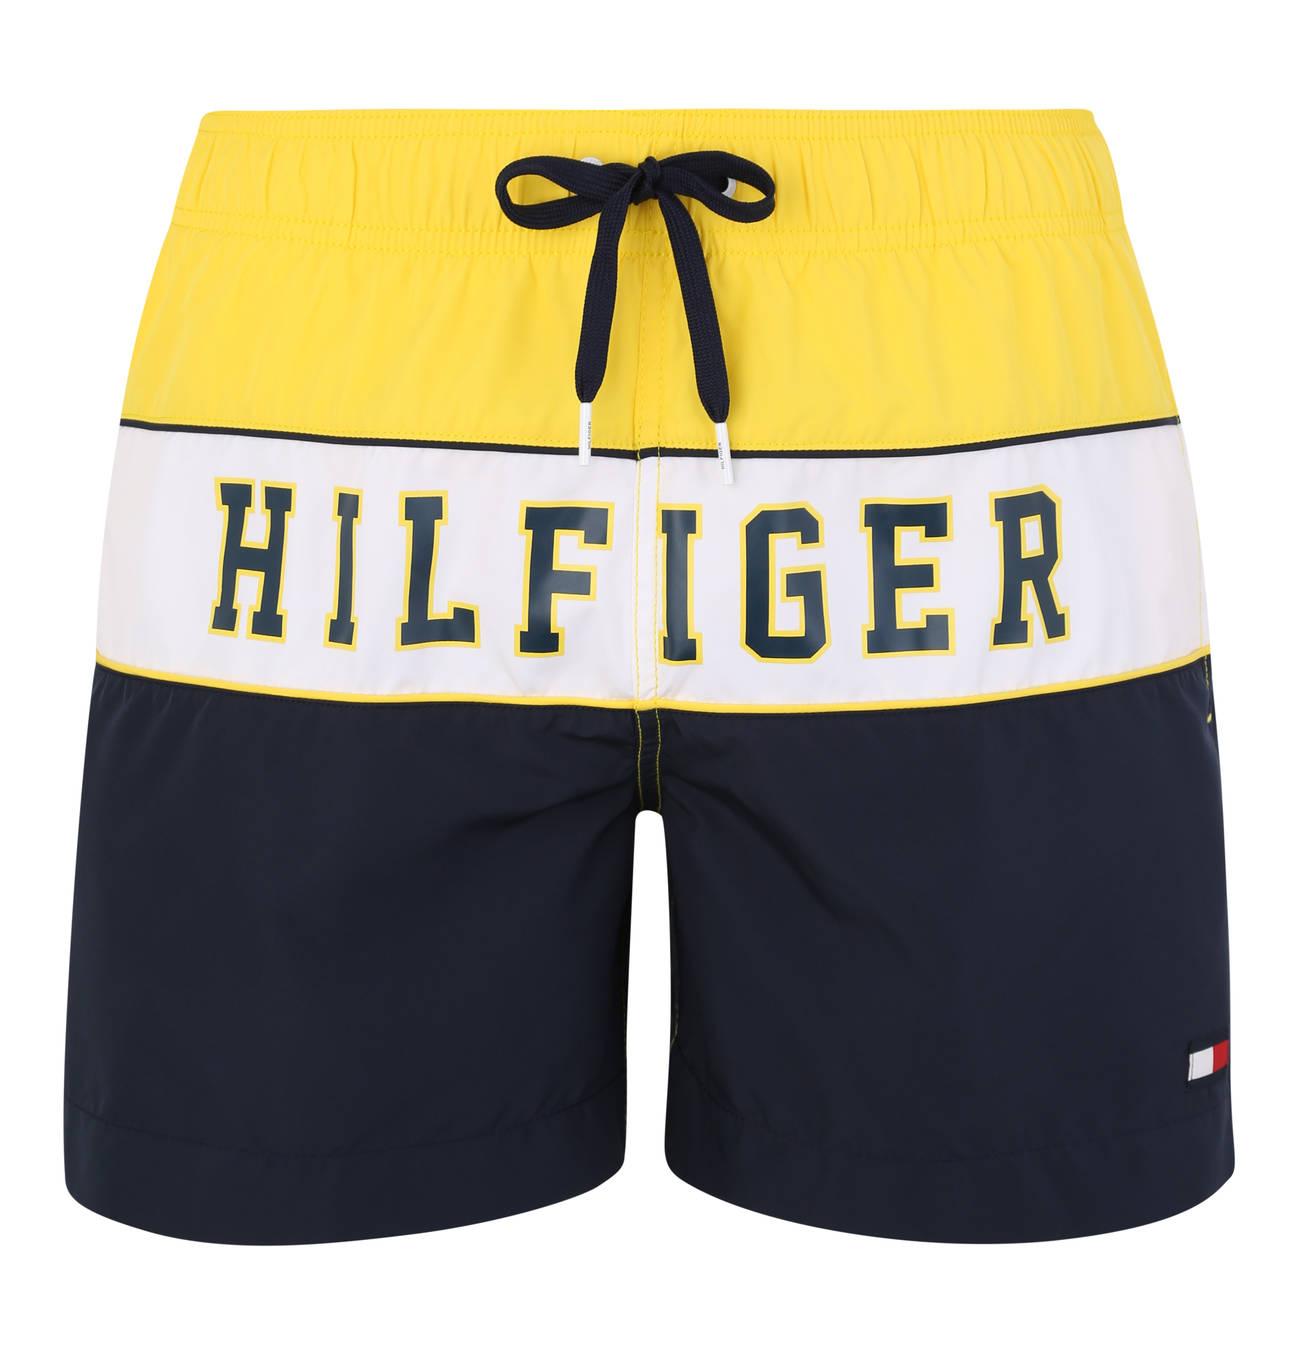 Pin Von Rohit Navghare Auf Shorts Badeshorts Colour Blocking Tommy Hilfiger